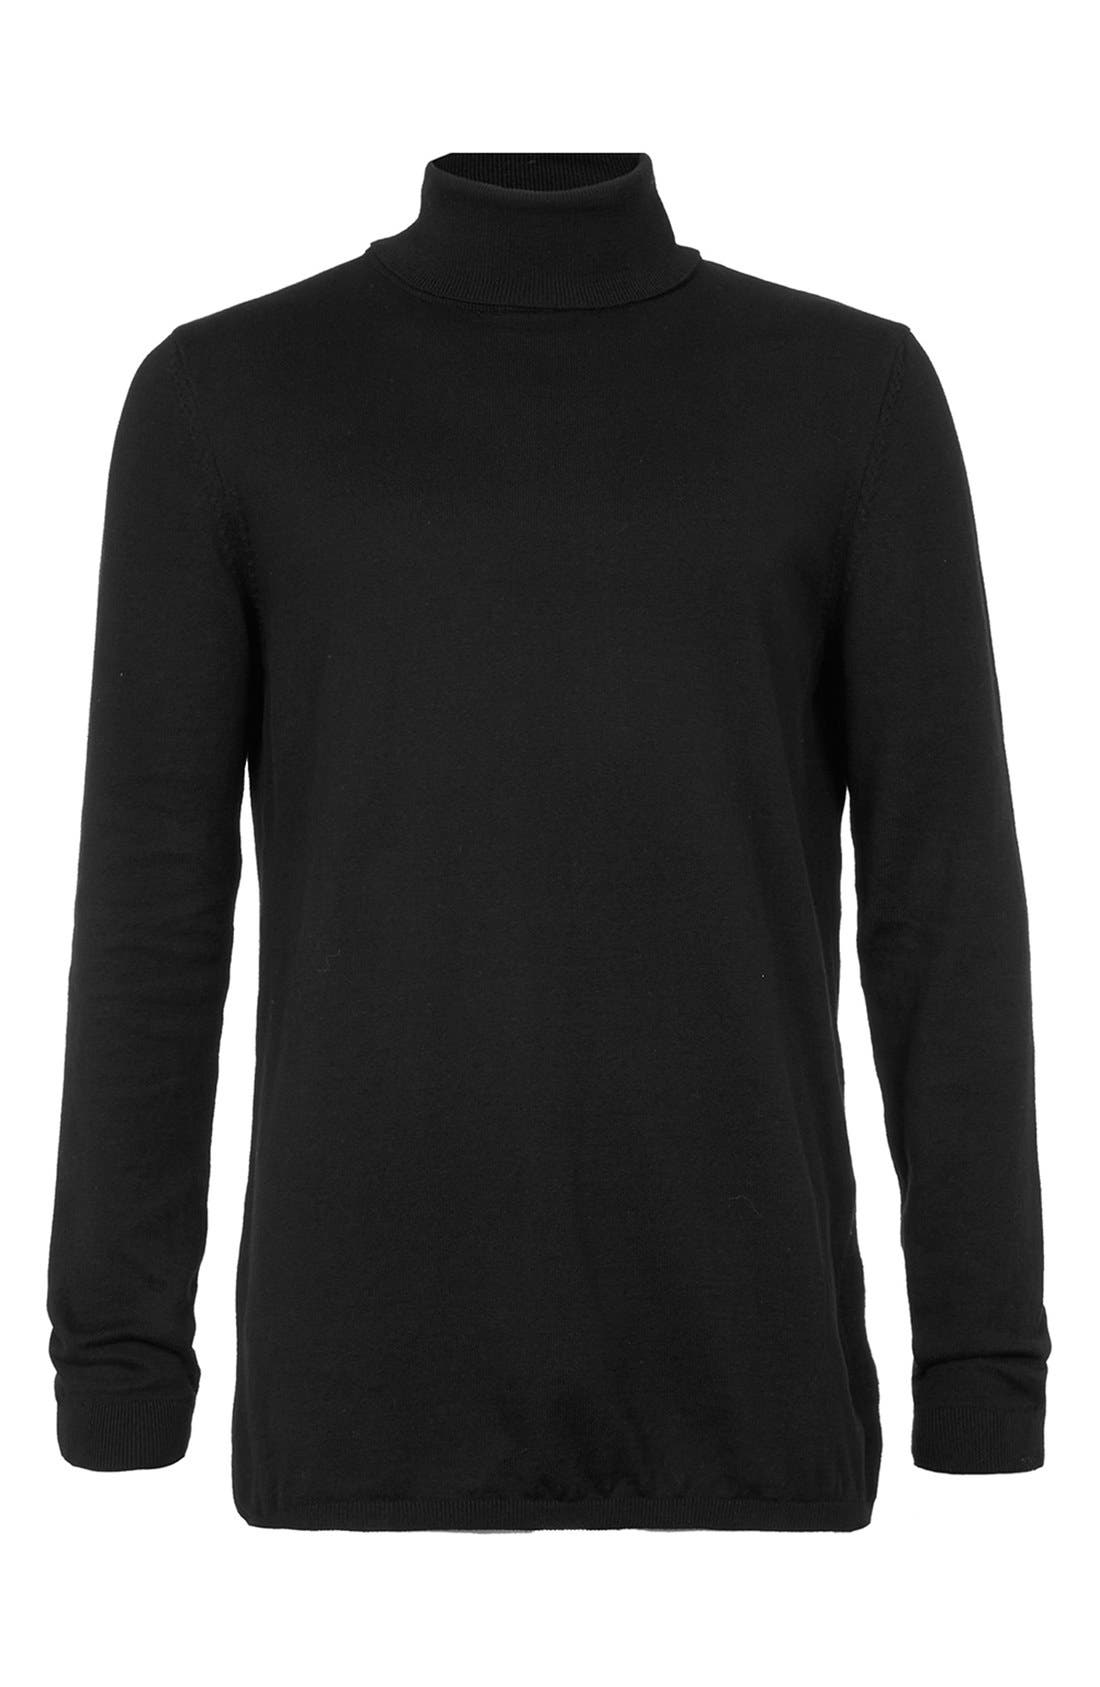 Longline Turtleneck Sweater,                             Alternate thumbnail 5, color,                             001